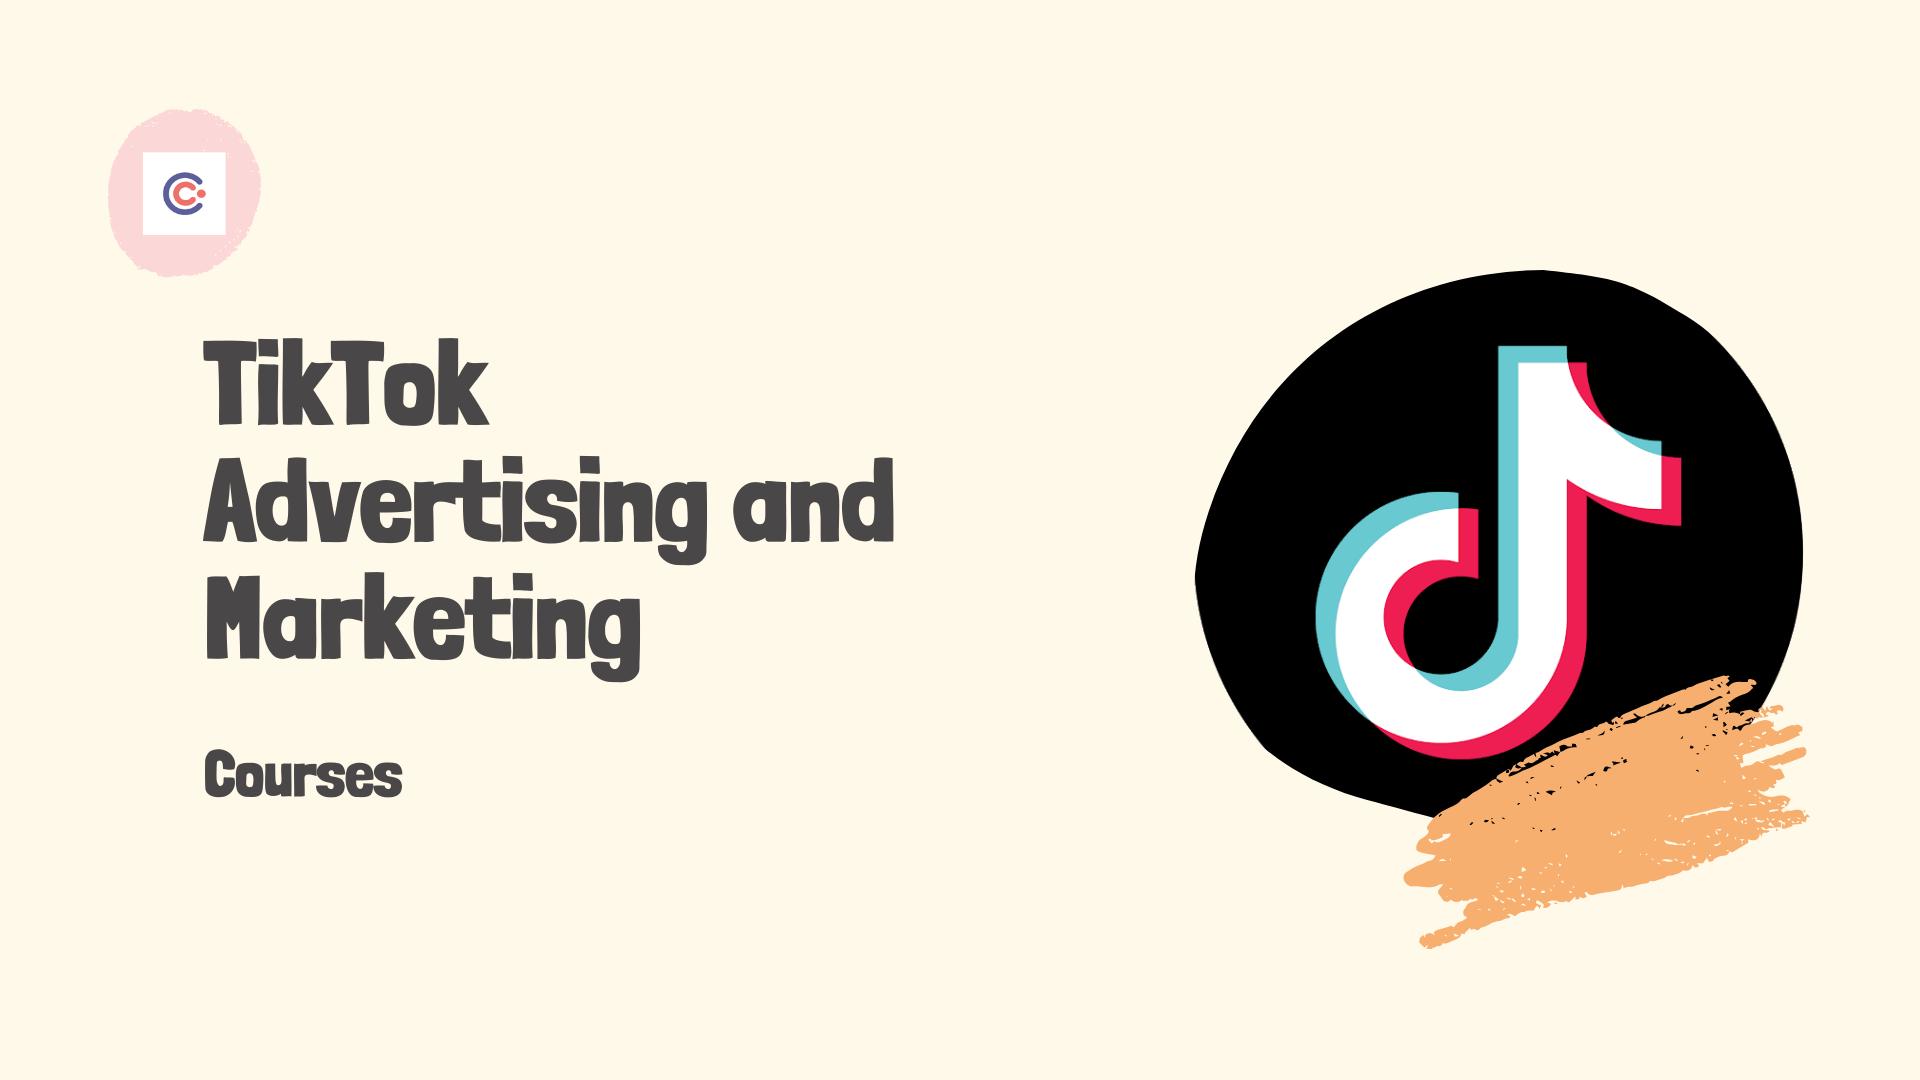 5 Best TikTok Advertising Courses - Learn TikTok Advertising and Marketing Online